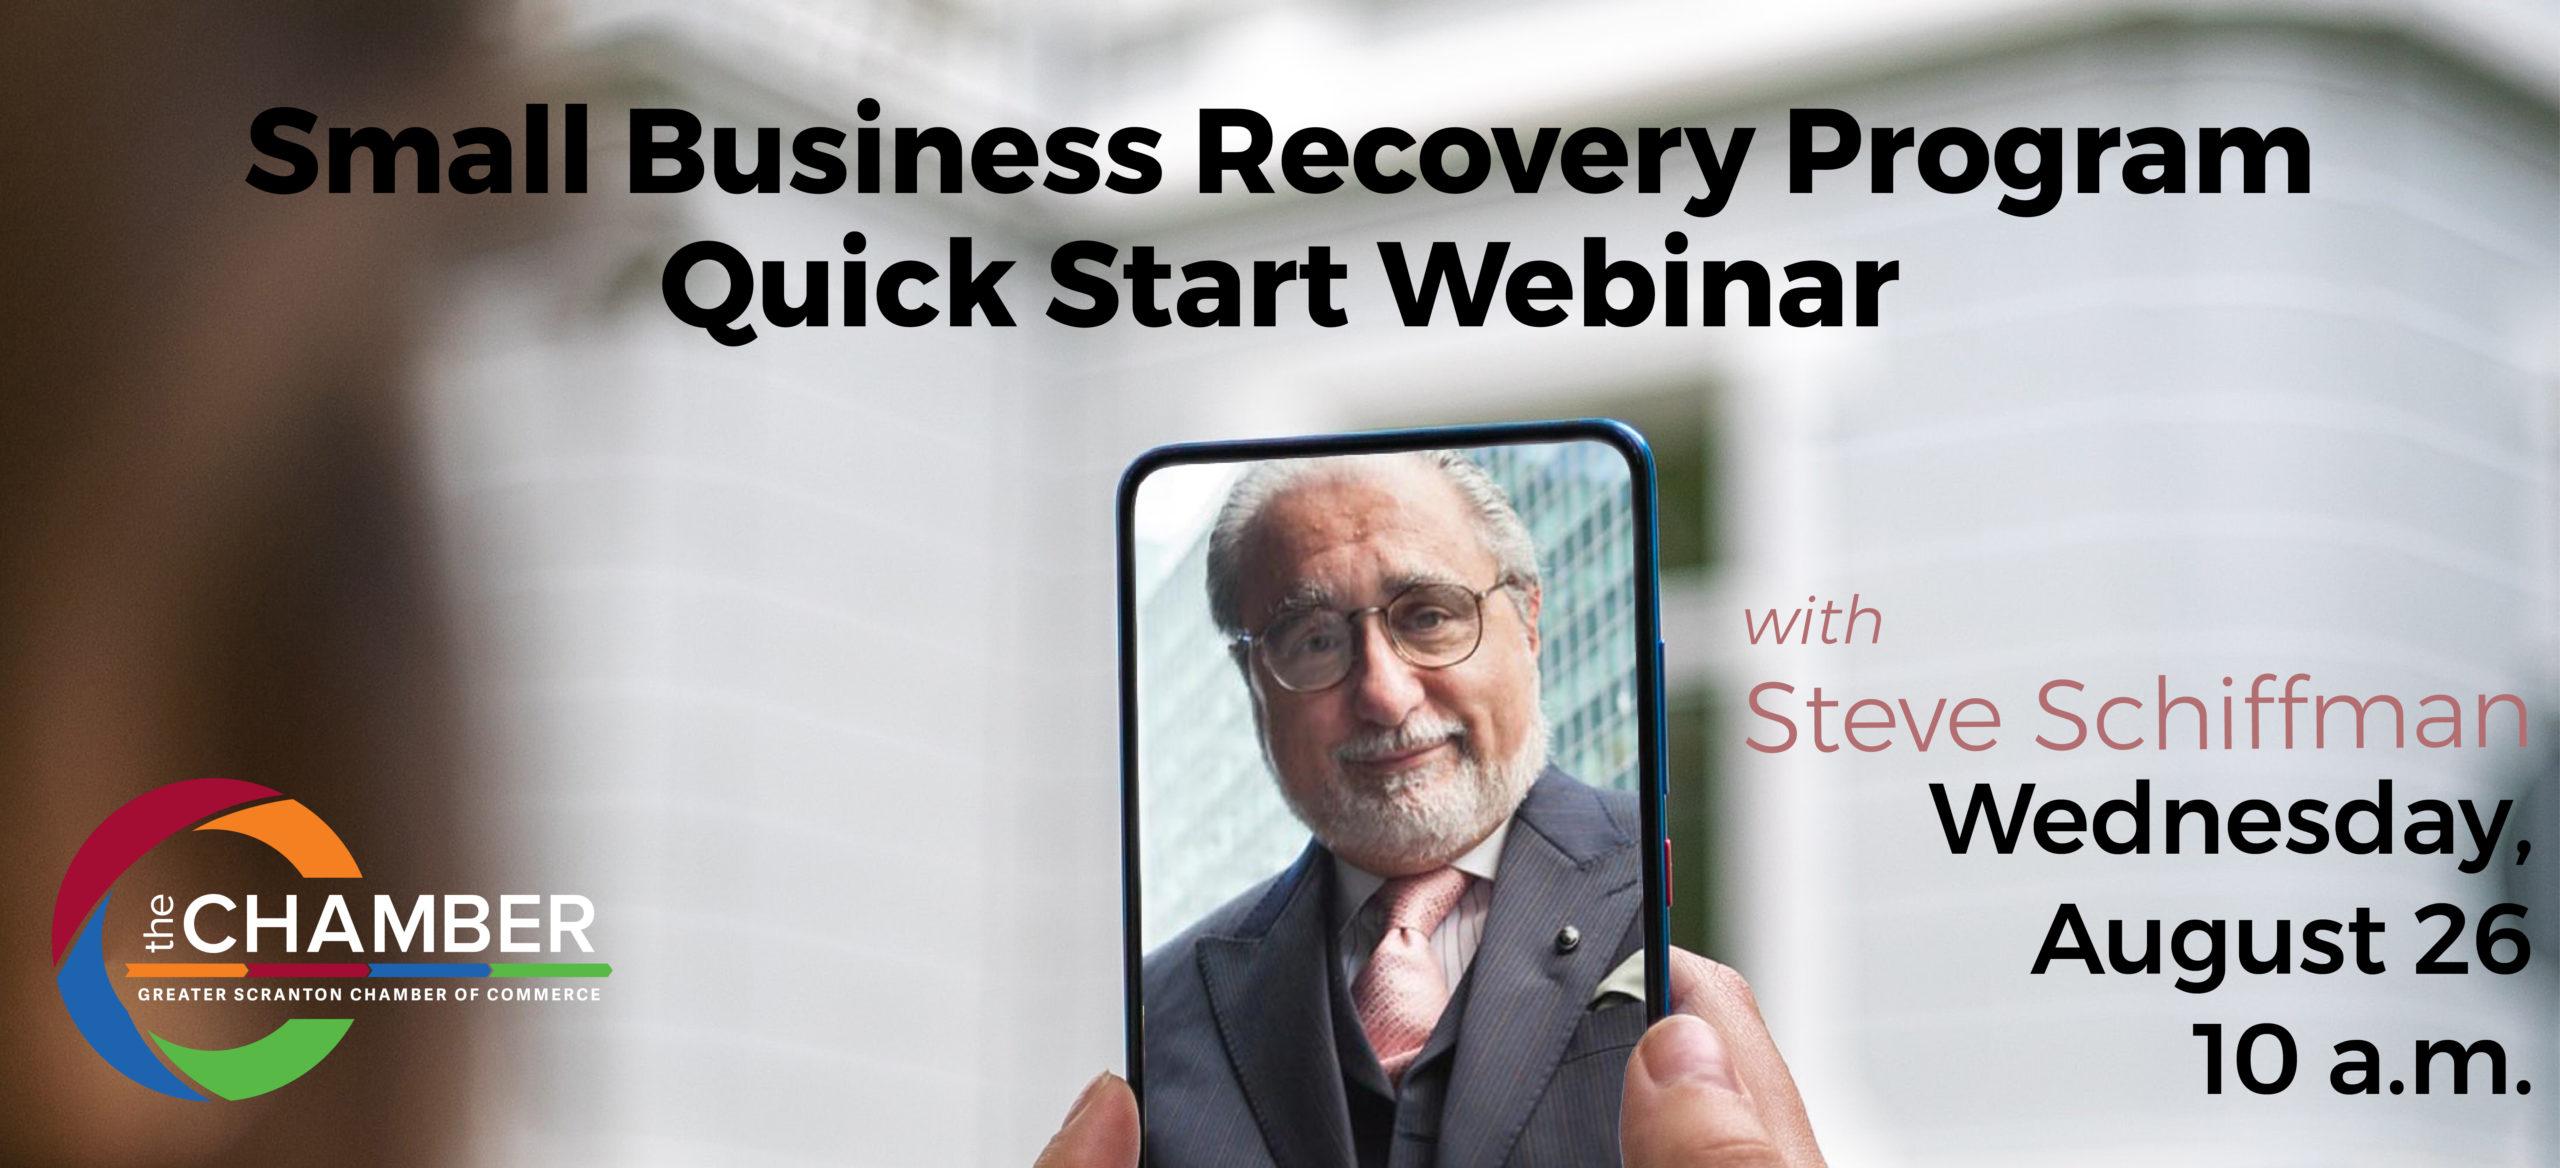 Small Business Recovery Program - Quick Start Webinar